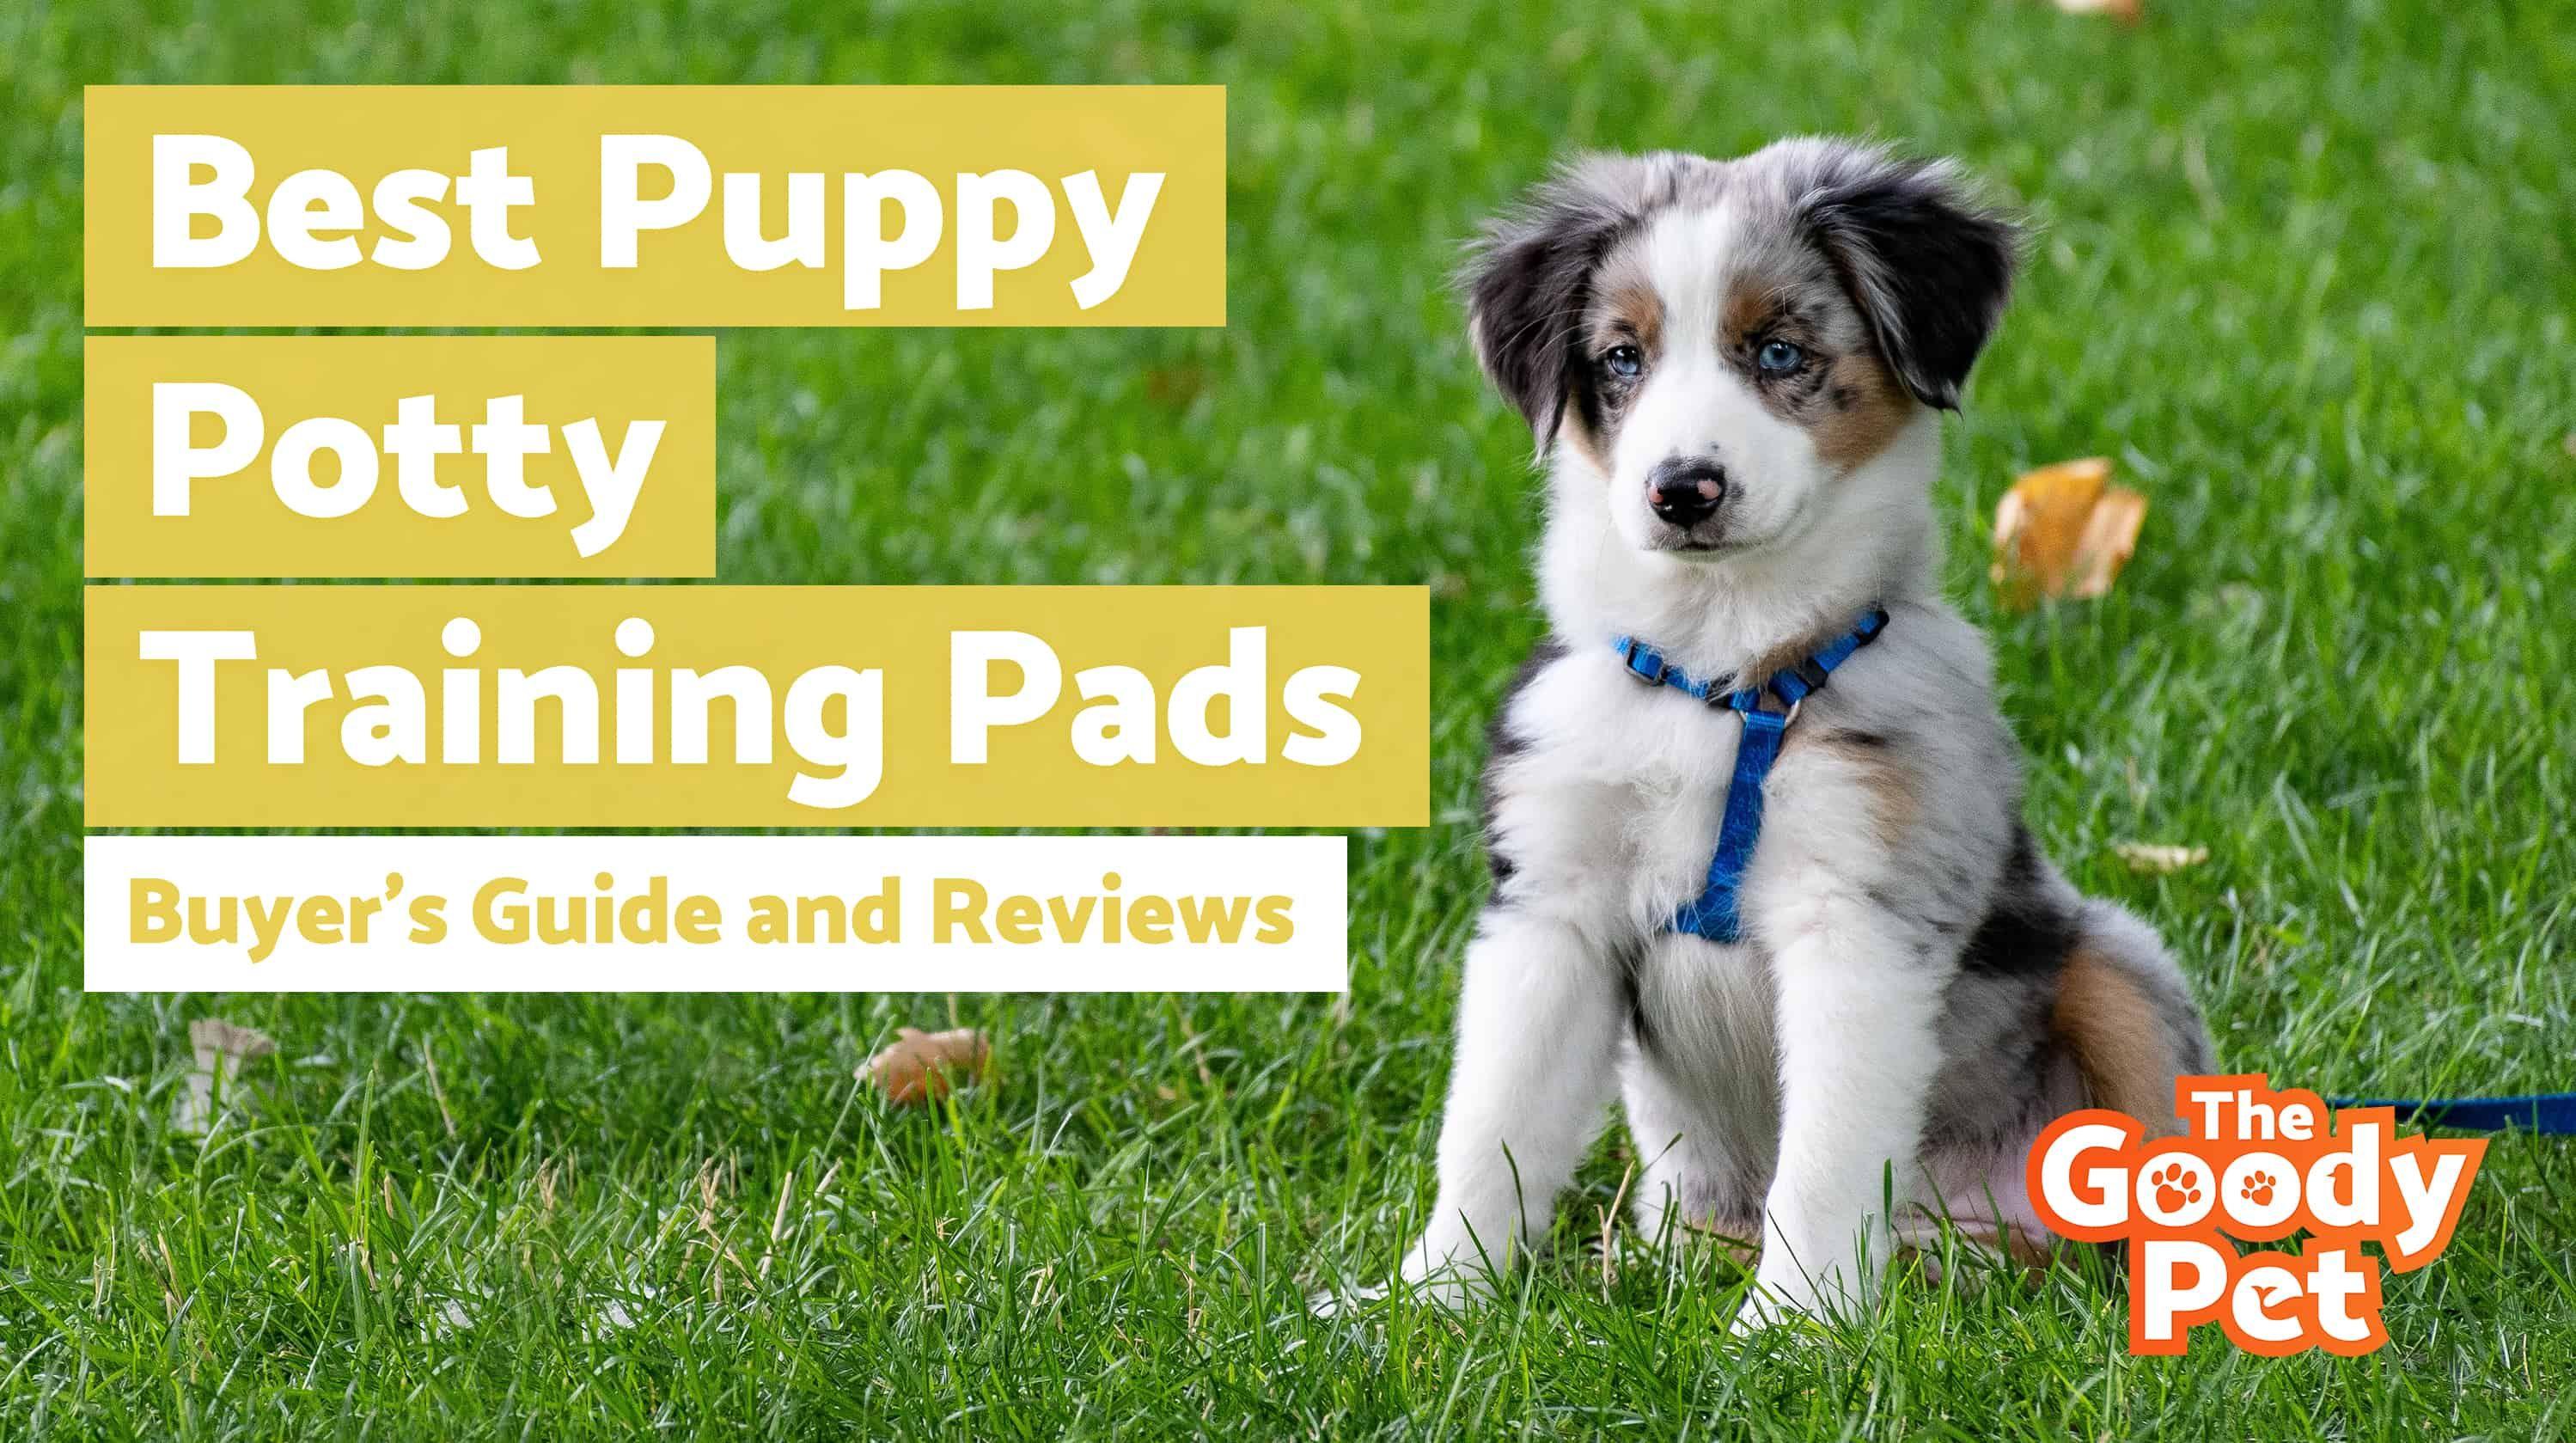 f6a540a9b2aaa8c97d697646ca00cde0 - How To Get My Puppy To Use Puppy Pads